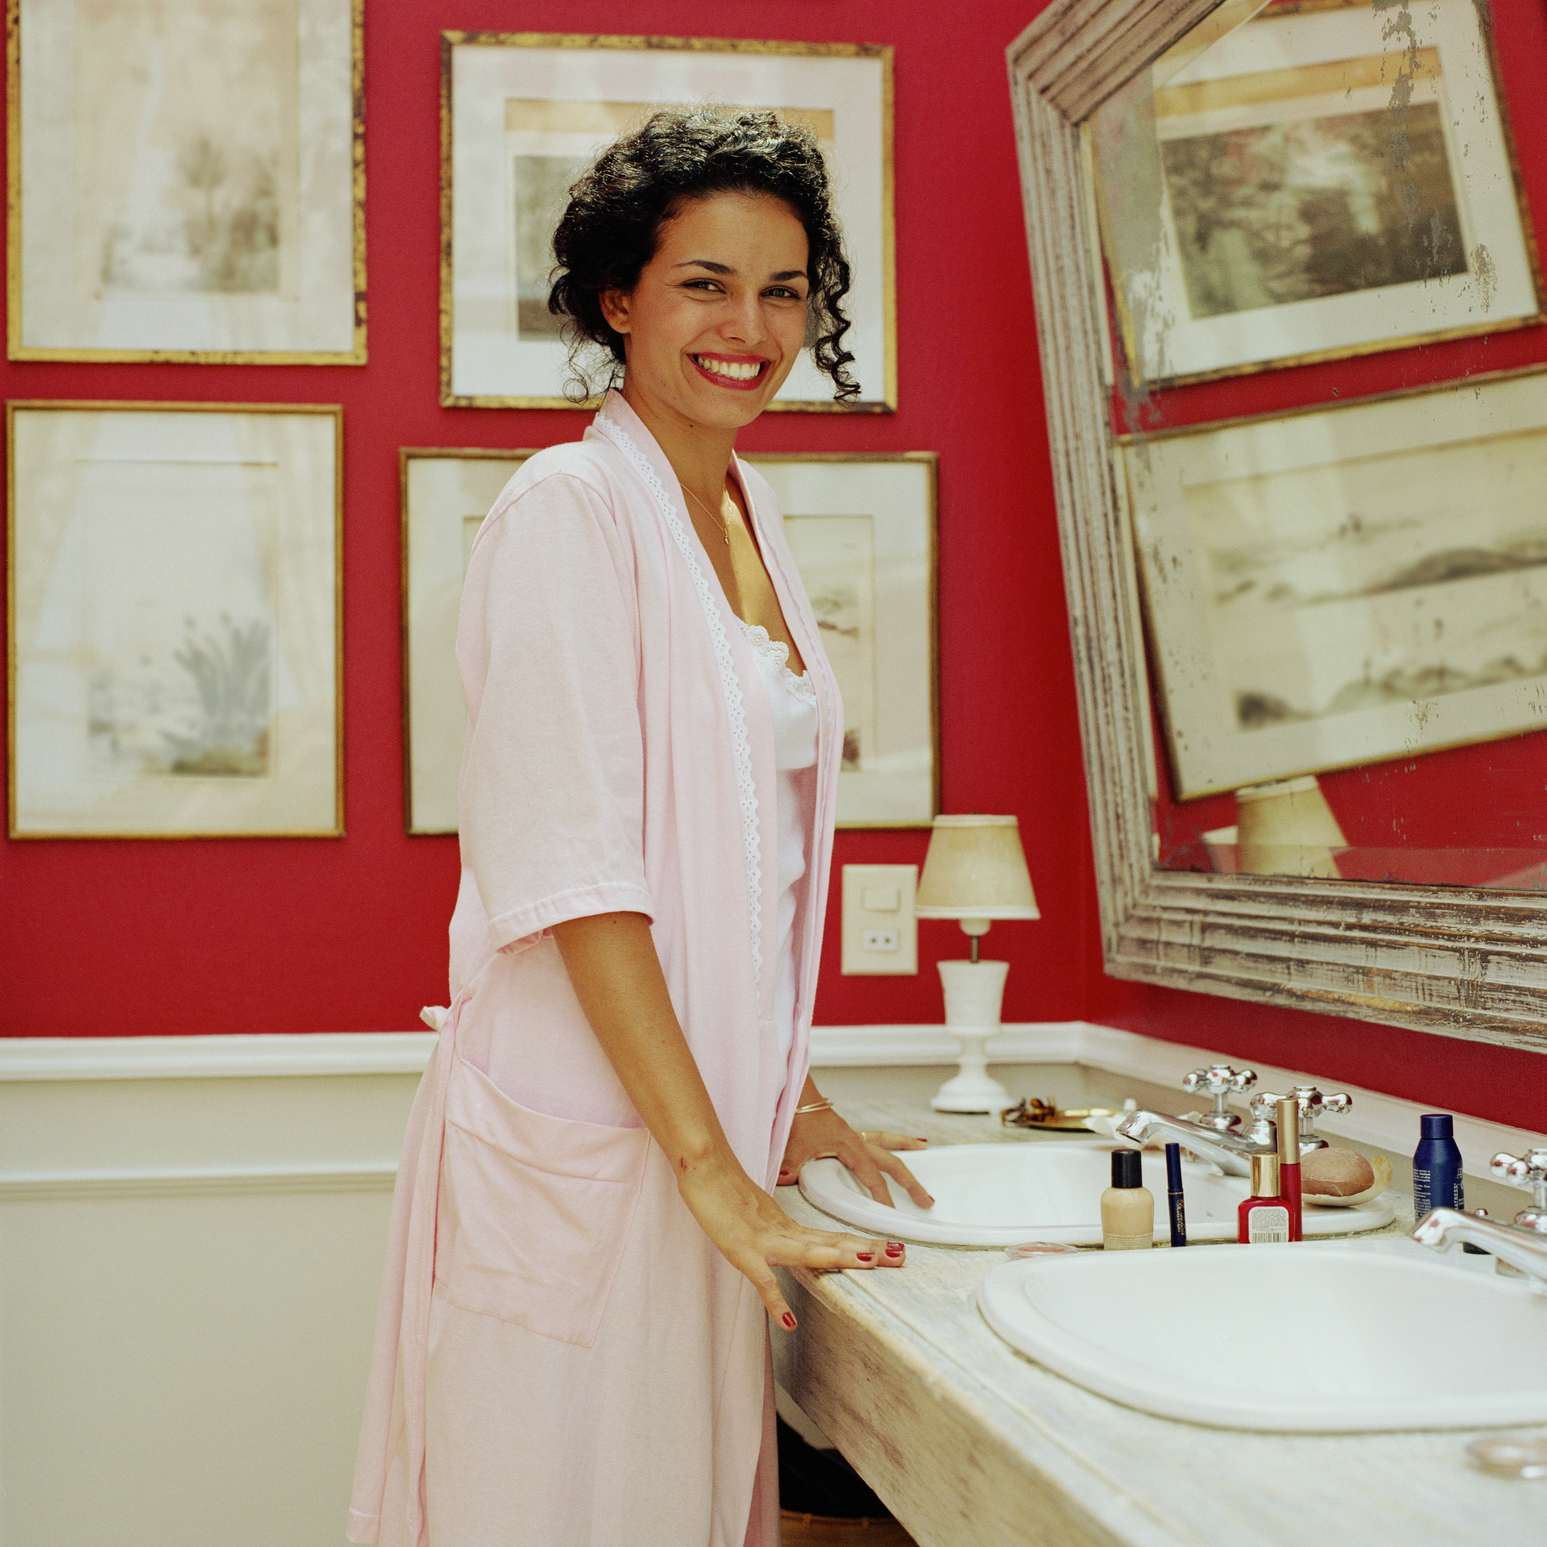 Woman in a well-lit bathroom